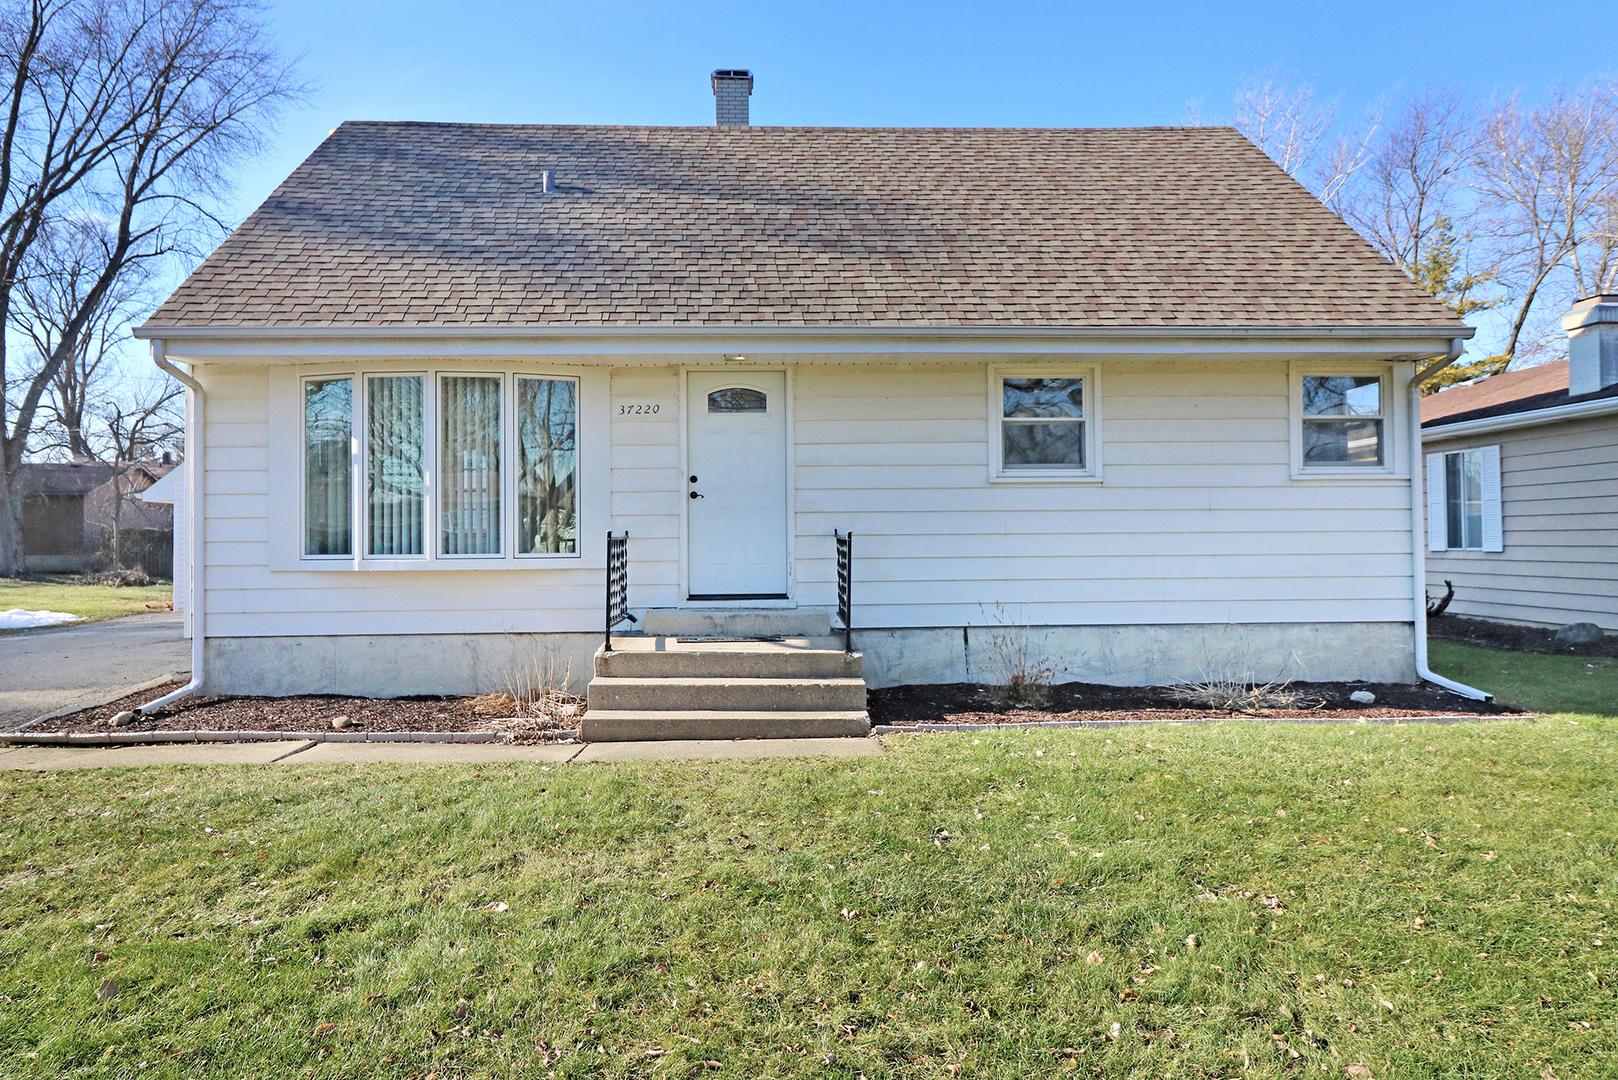 37220 North Hampshire Lane, Lake Villa, Illinois 60046